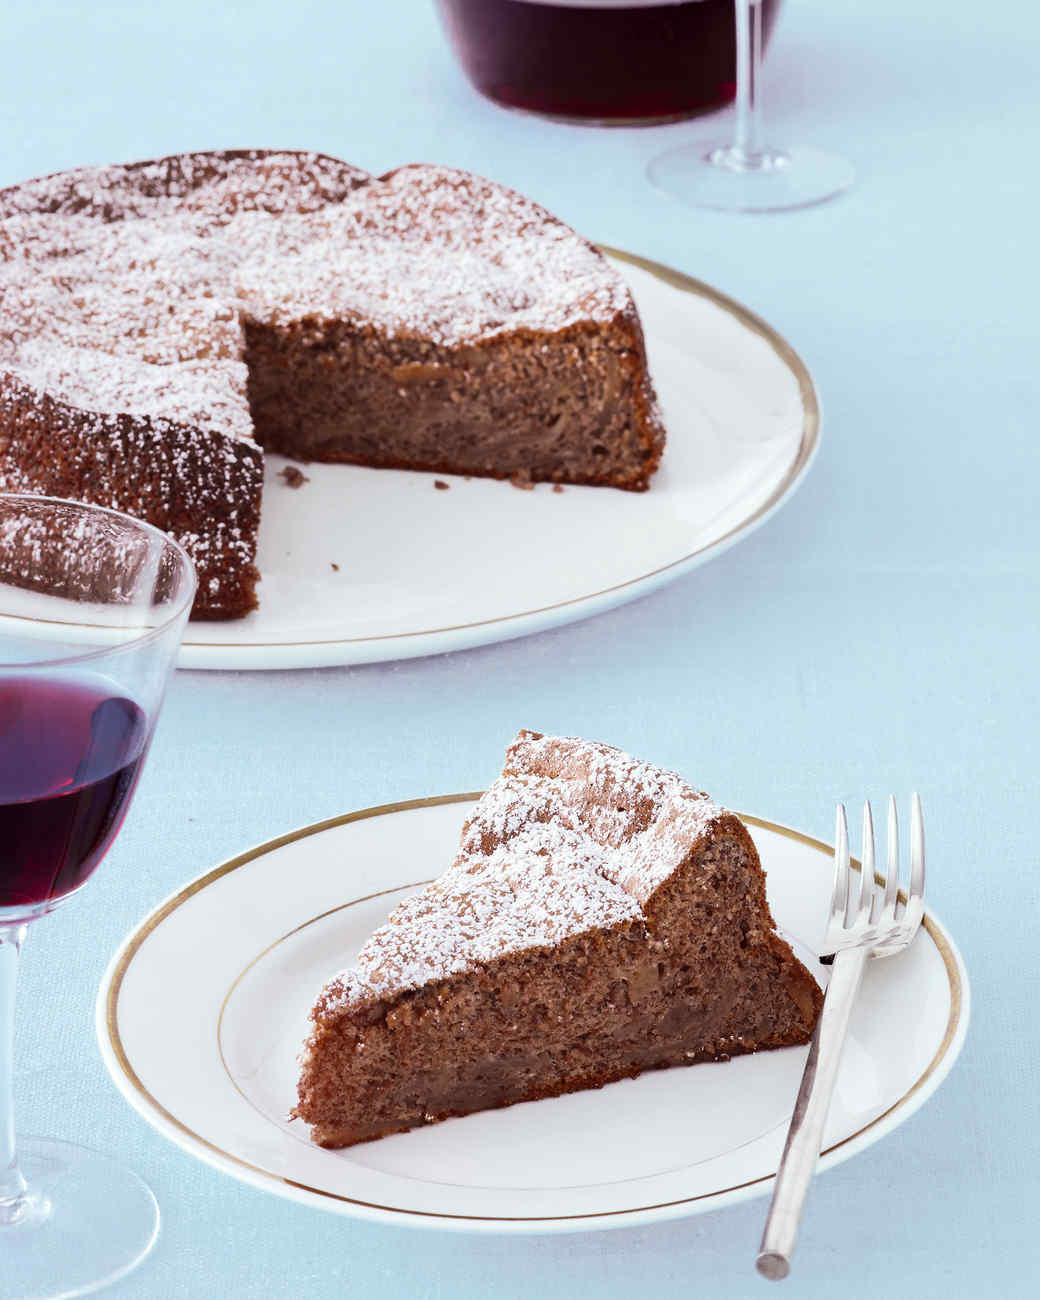 Martha stewart apple pecan cake recipe